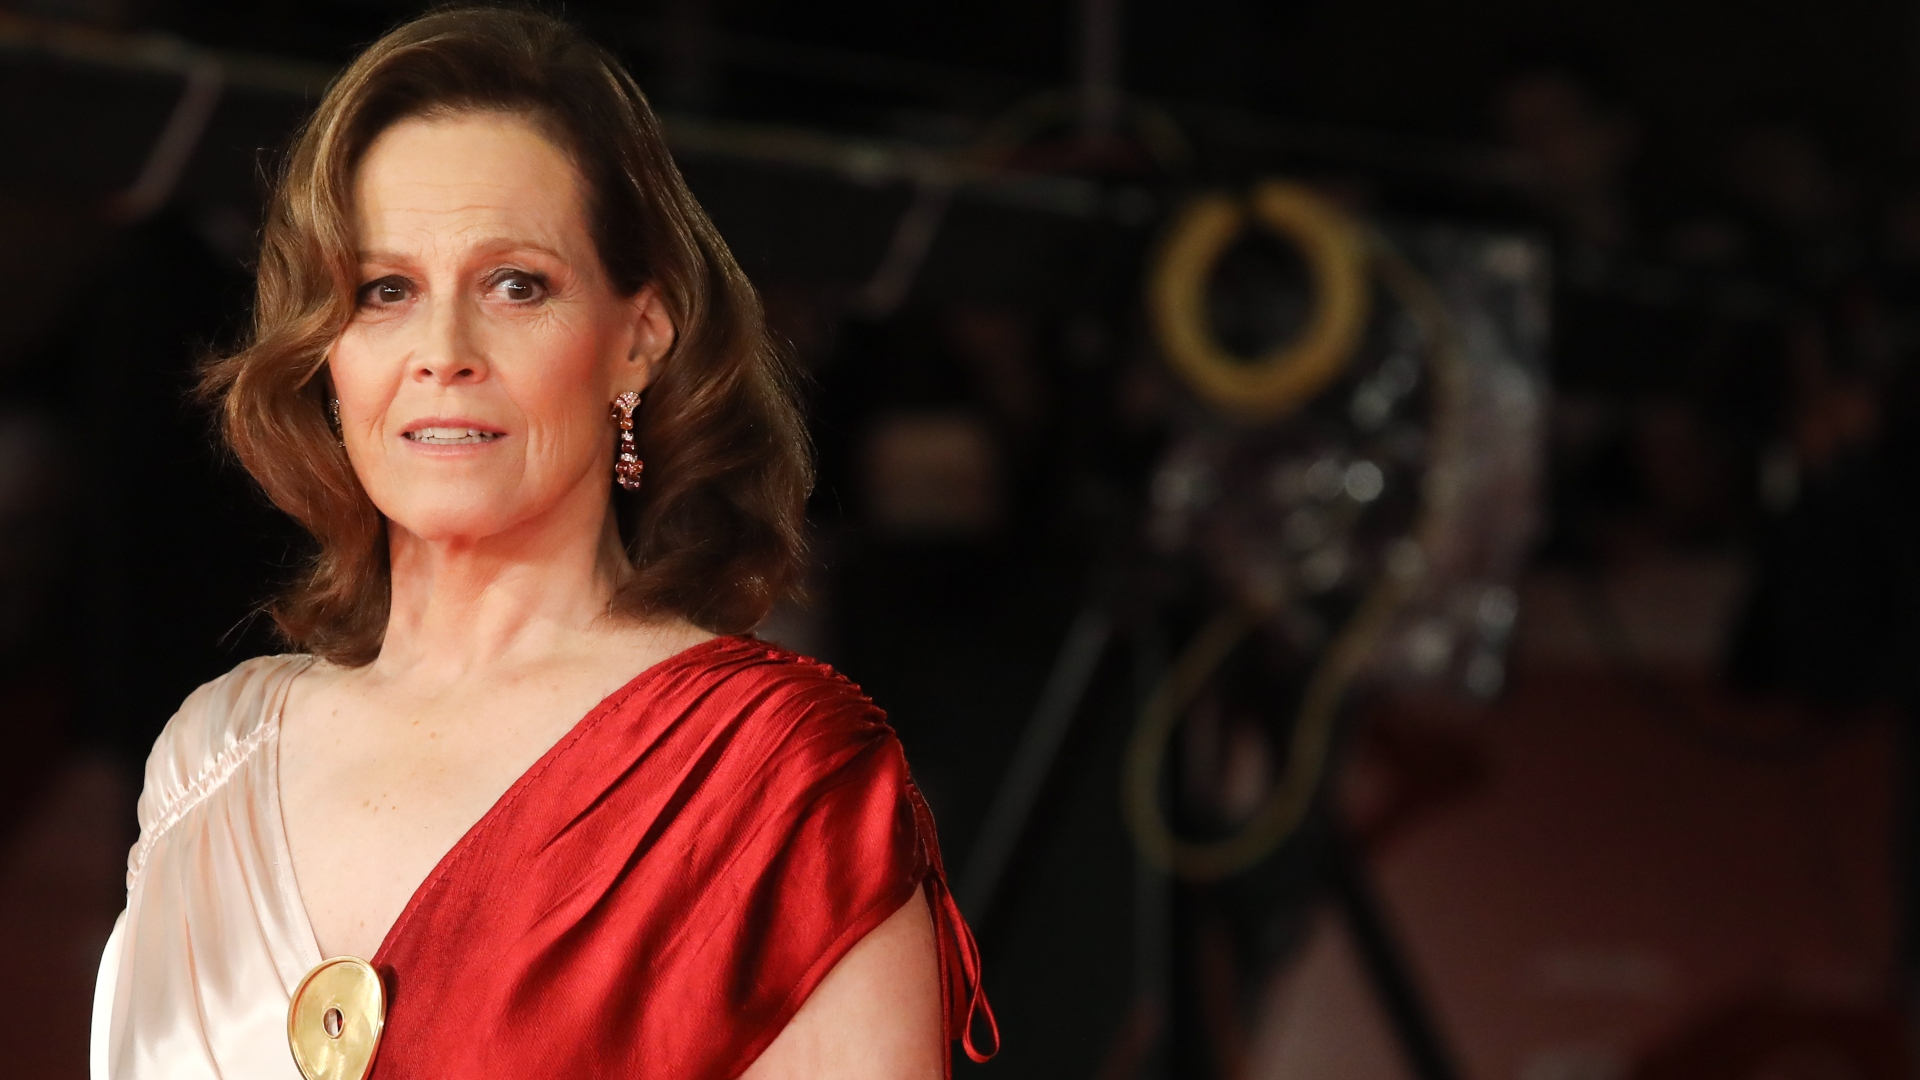 Sigourney Weaver joins the Marvel Cinematic Universe   Newshub